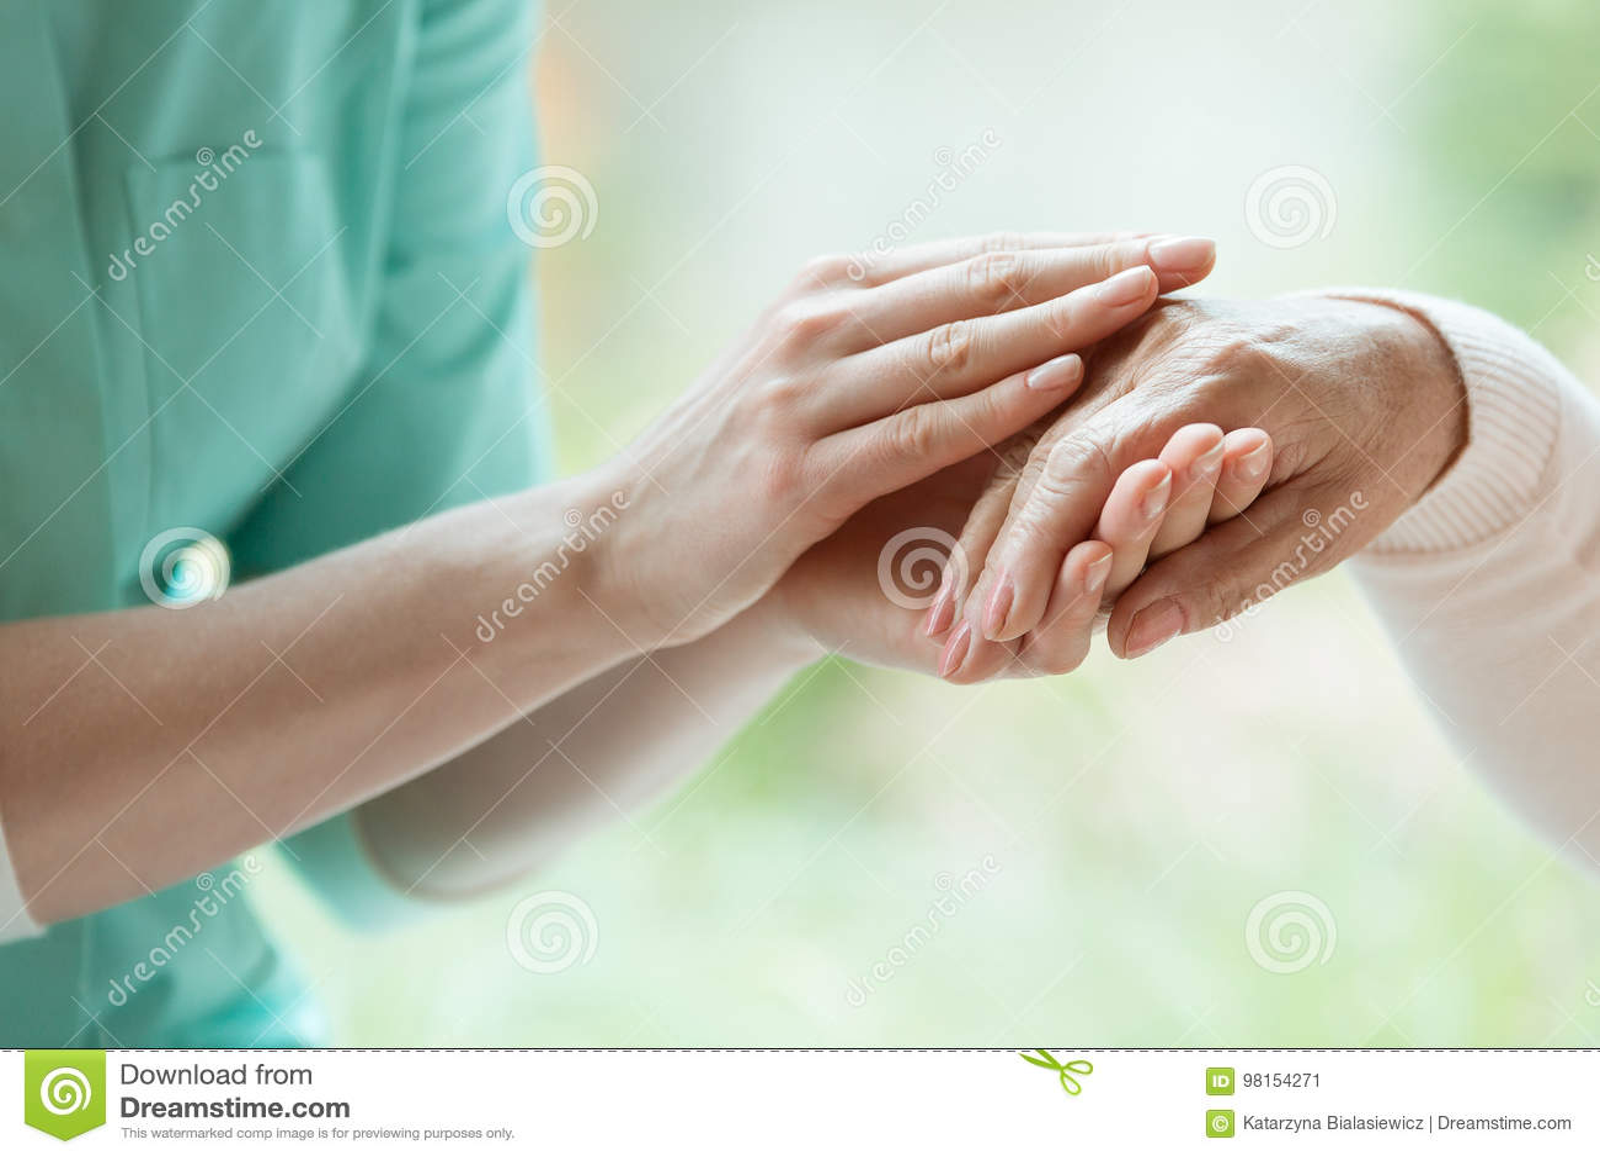 Caretaker massaging pensioner`s hand